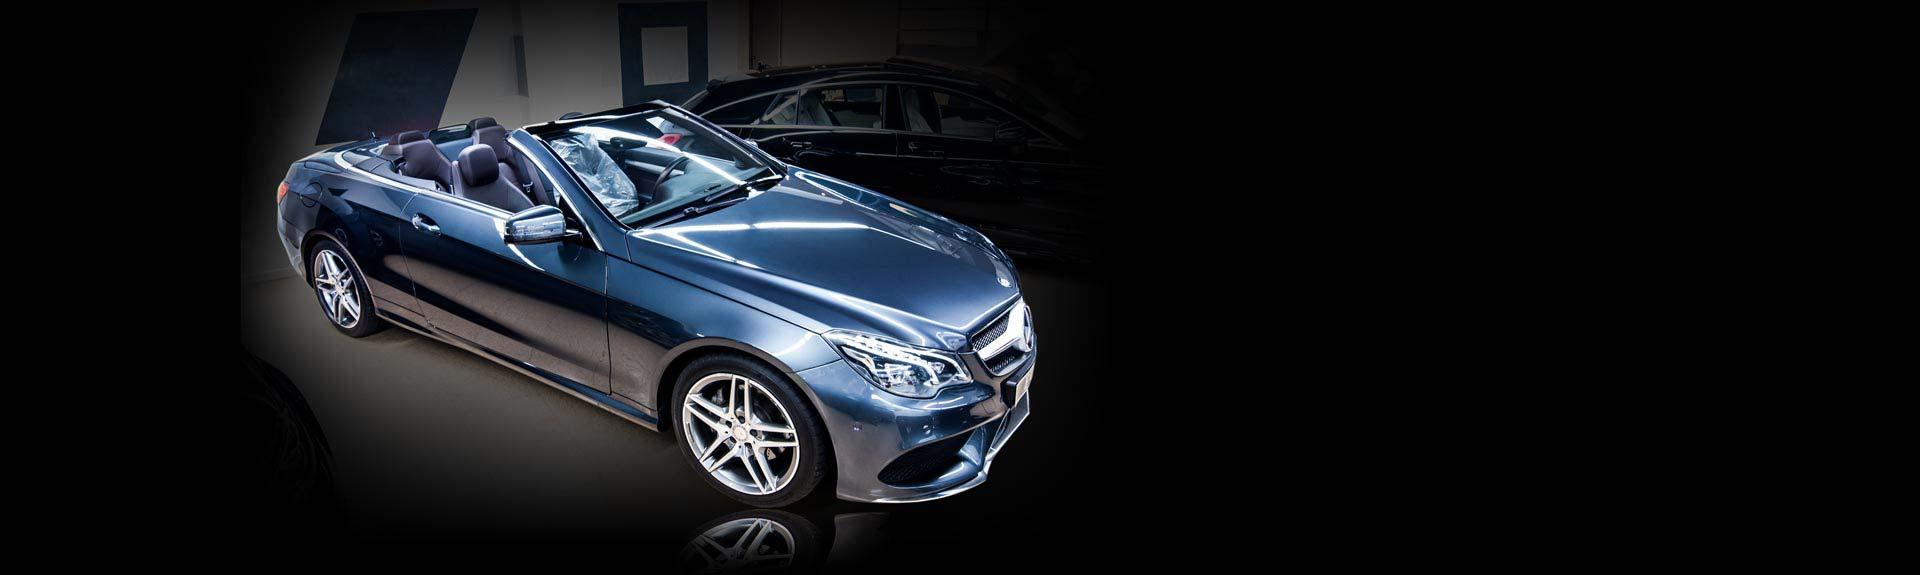 Descapotables - Auto Exclusive BCN - Concesionario Ocasión Mercedes Barcelona